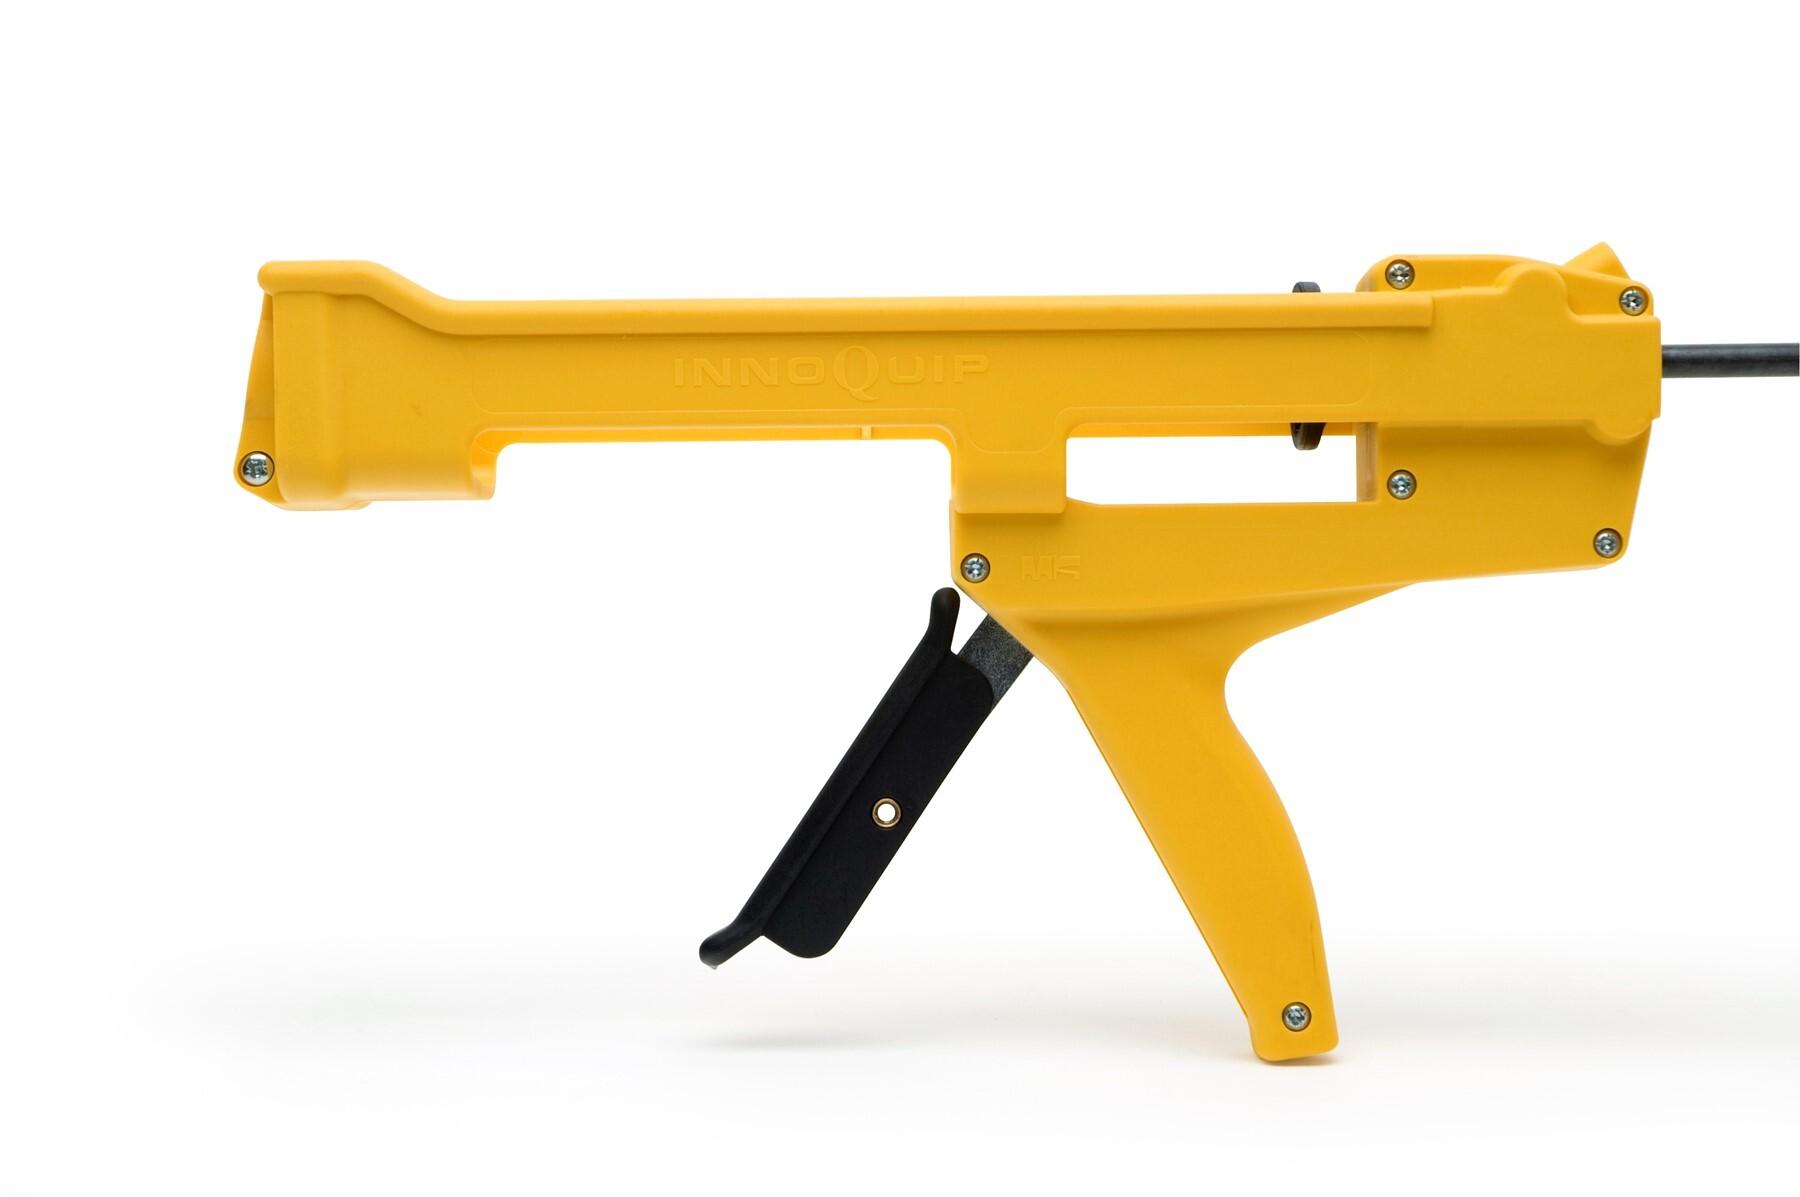 1609 Easy Grip Gun print